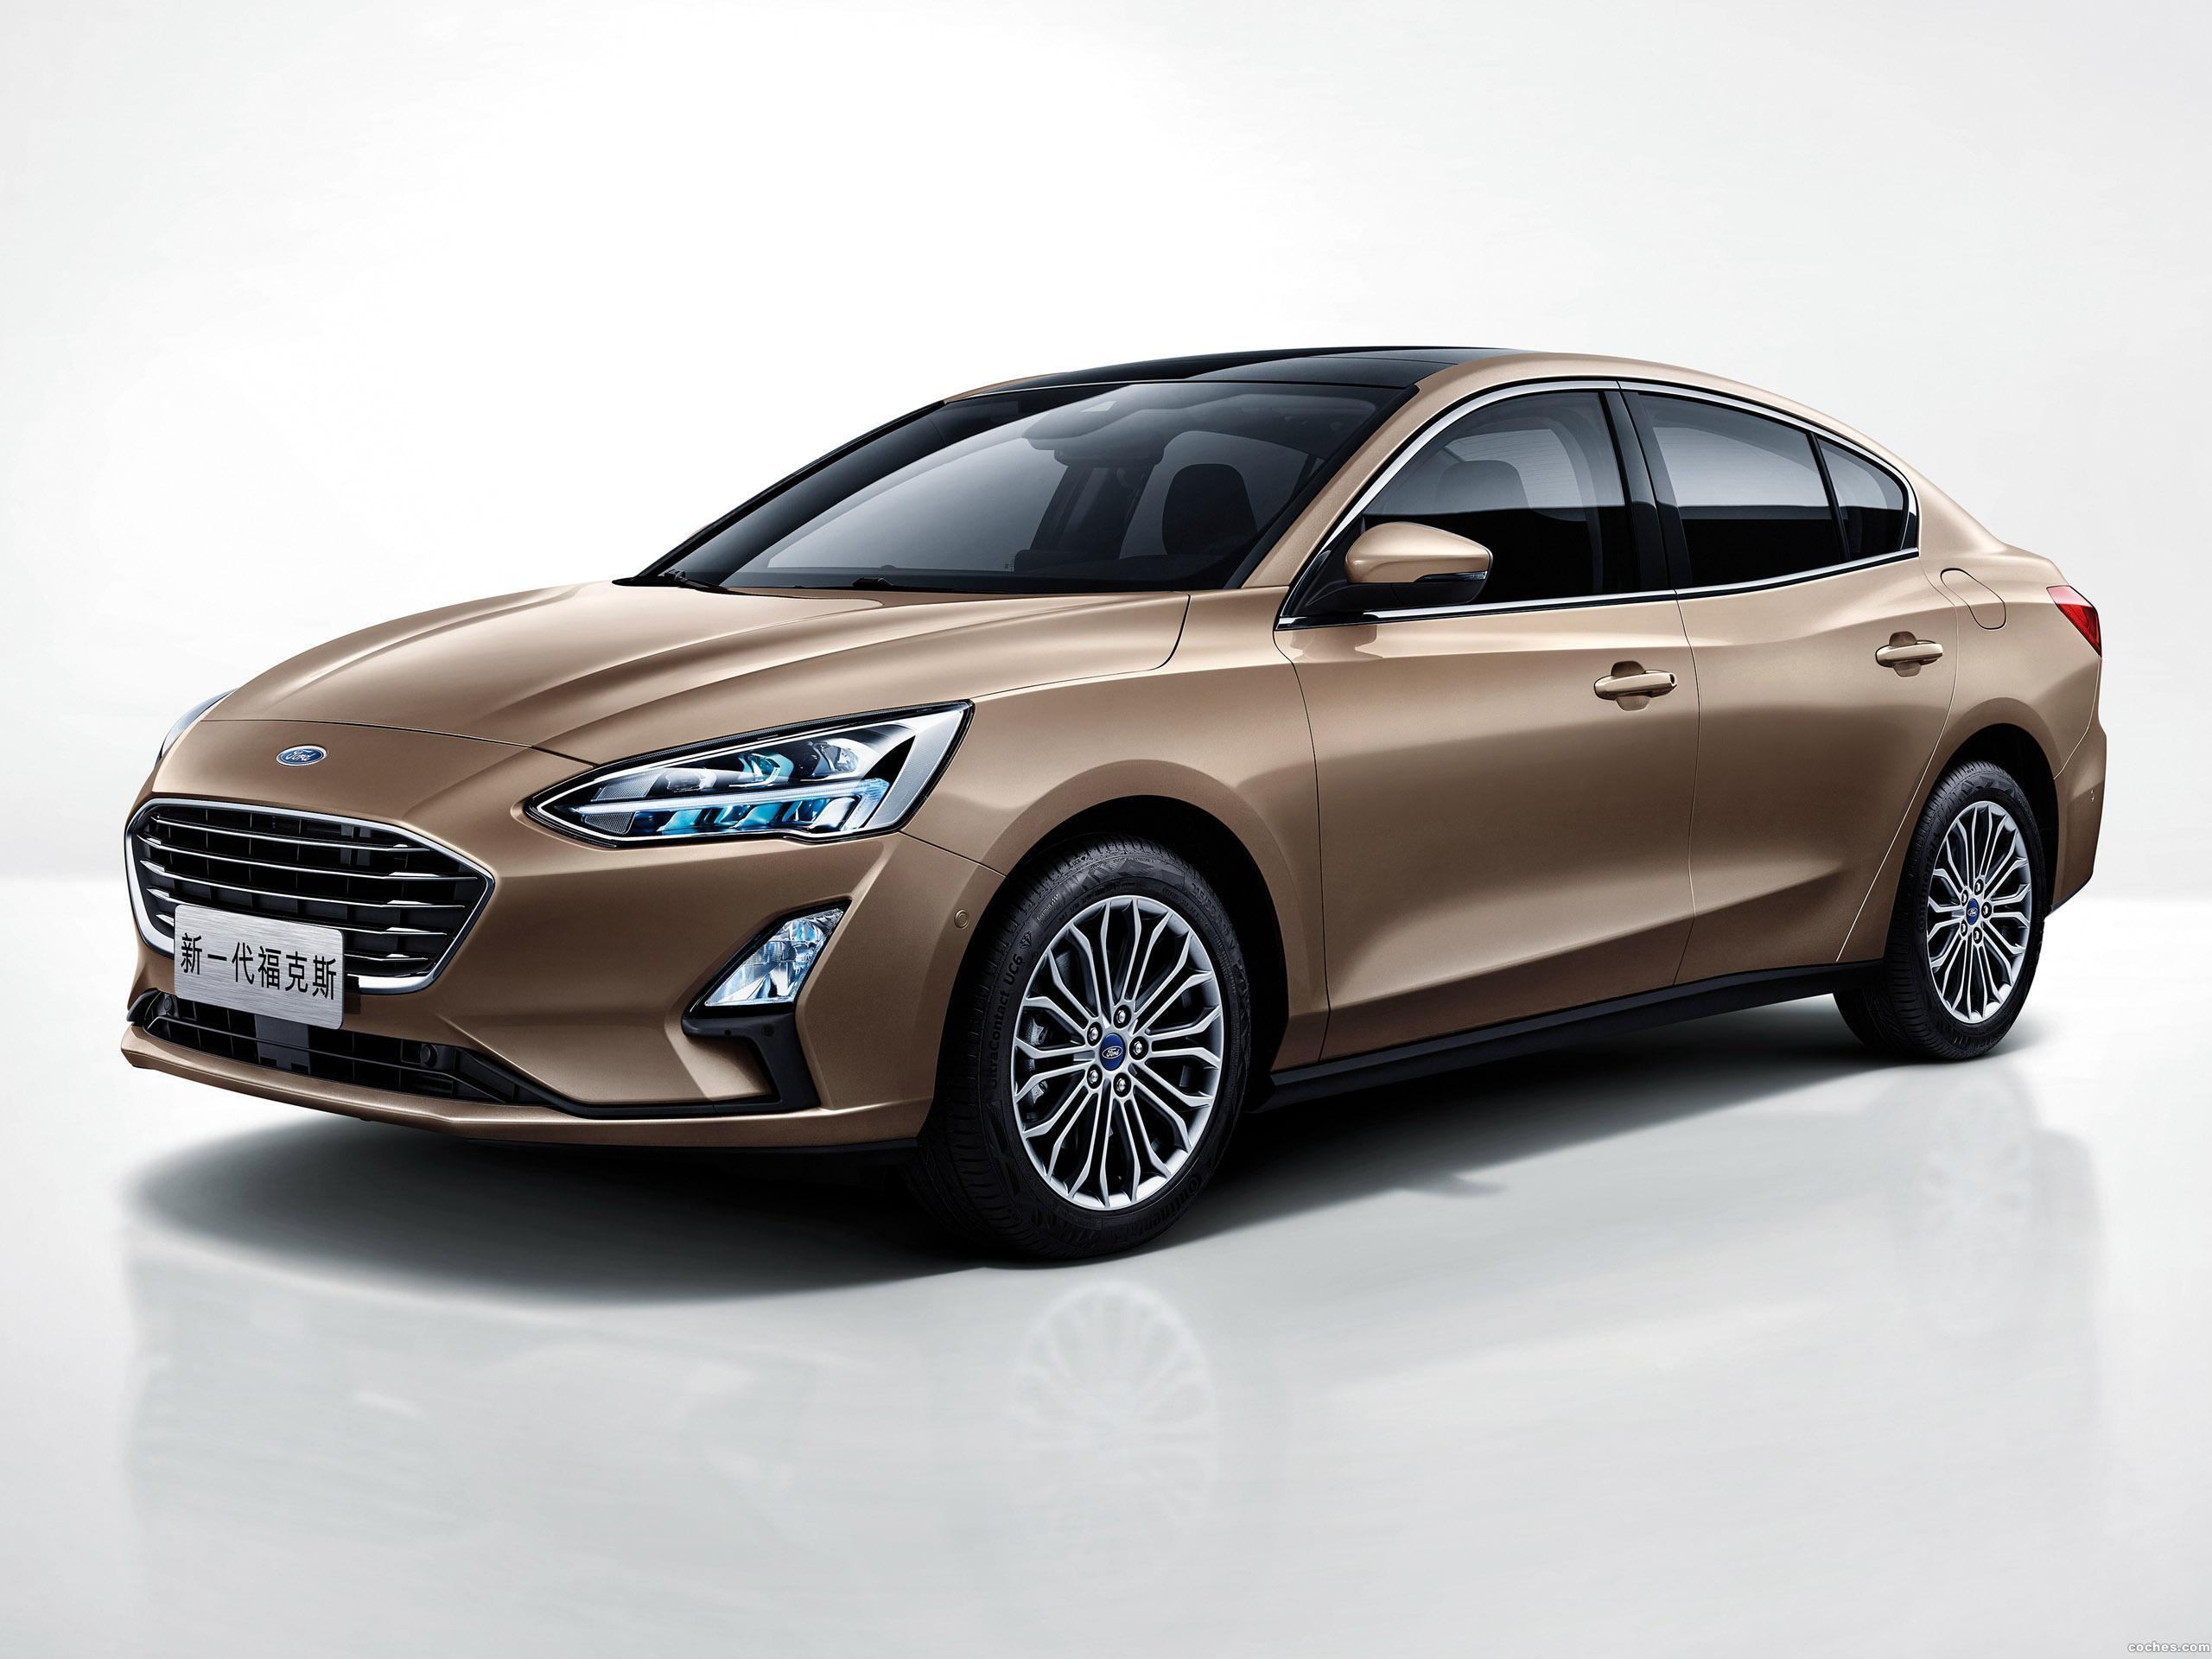 ford_focus-titanium-sedan-china-2018_r8.jpg